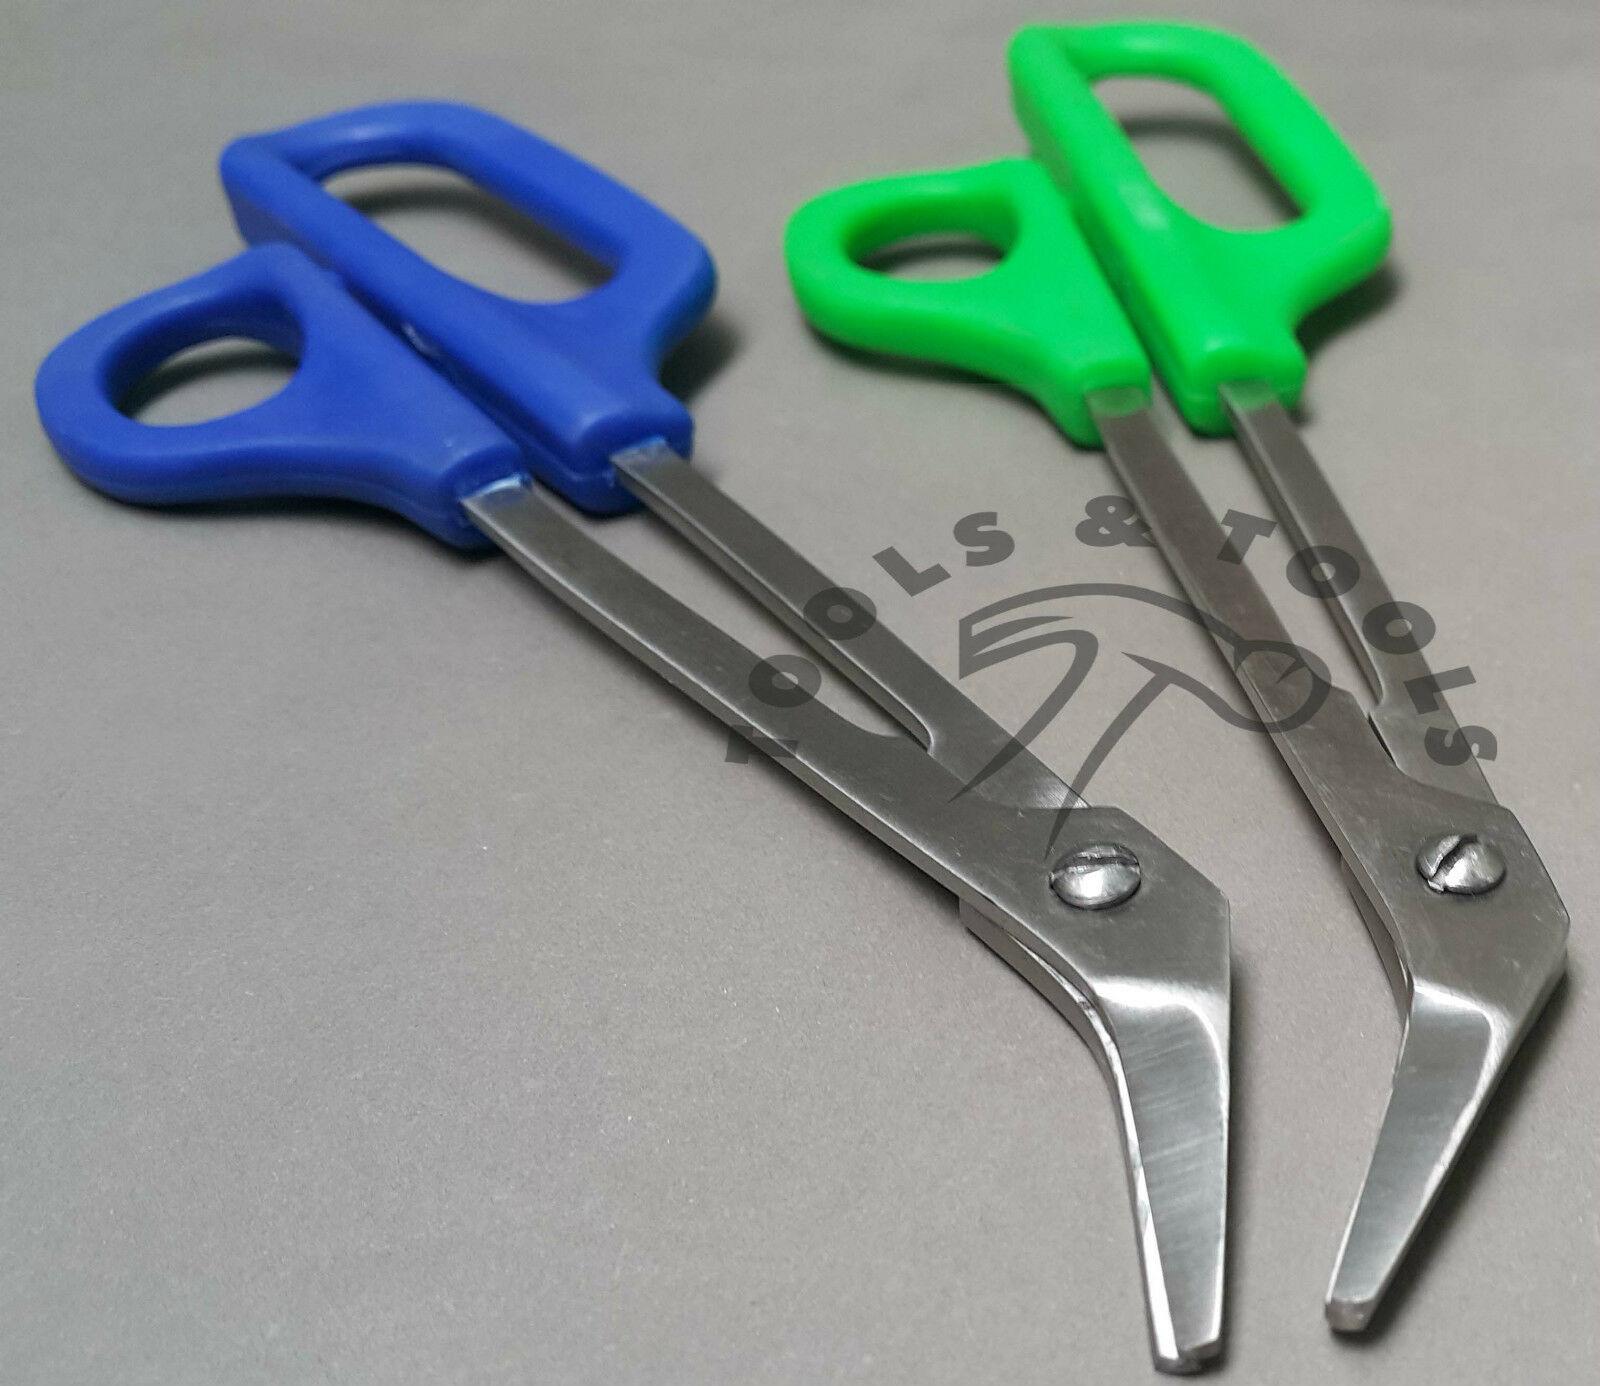 SET OF 2 TOE NAIL Clippers Scissors LONG REACH Manicure Pedicure ...